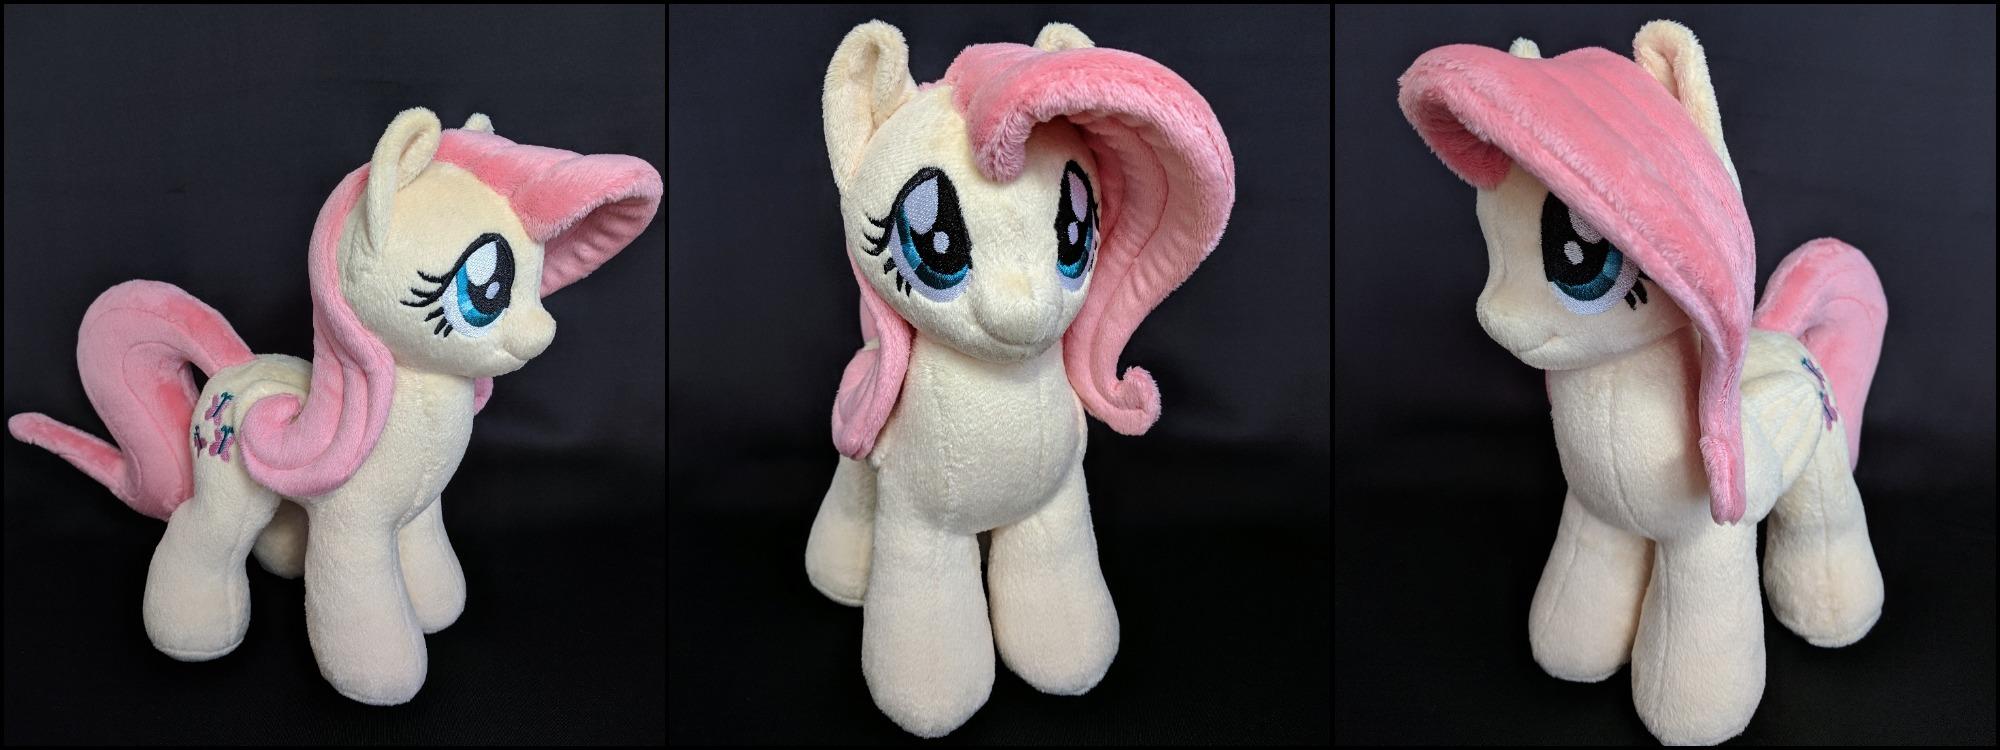 Fluttershy Plush Pony by Burgunzik